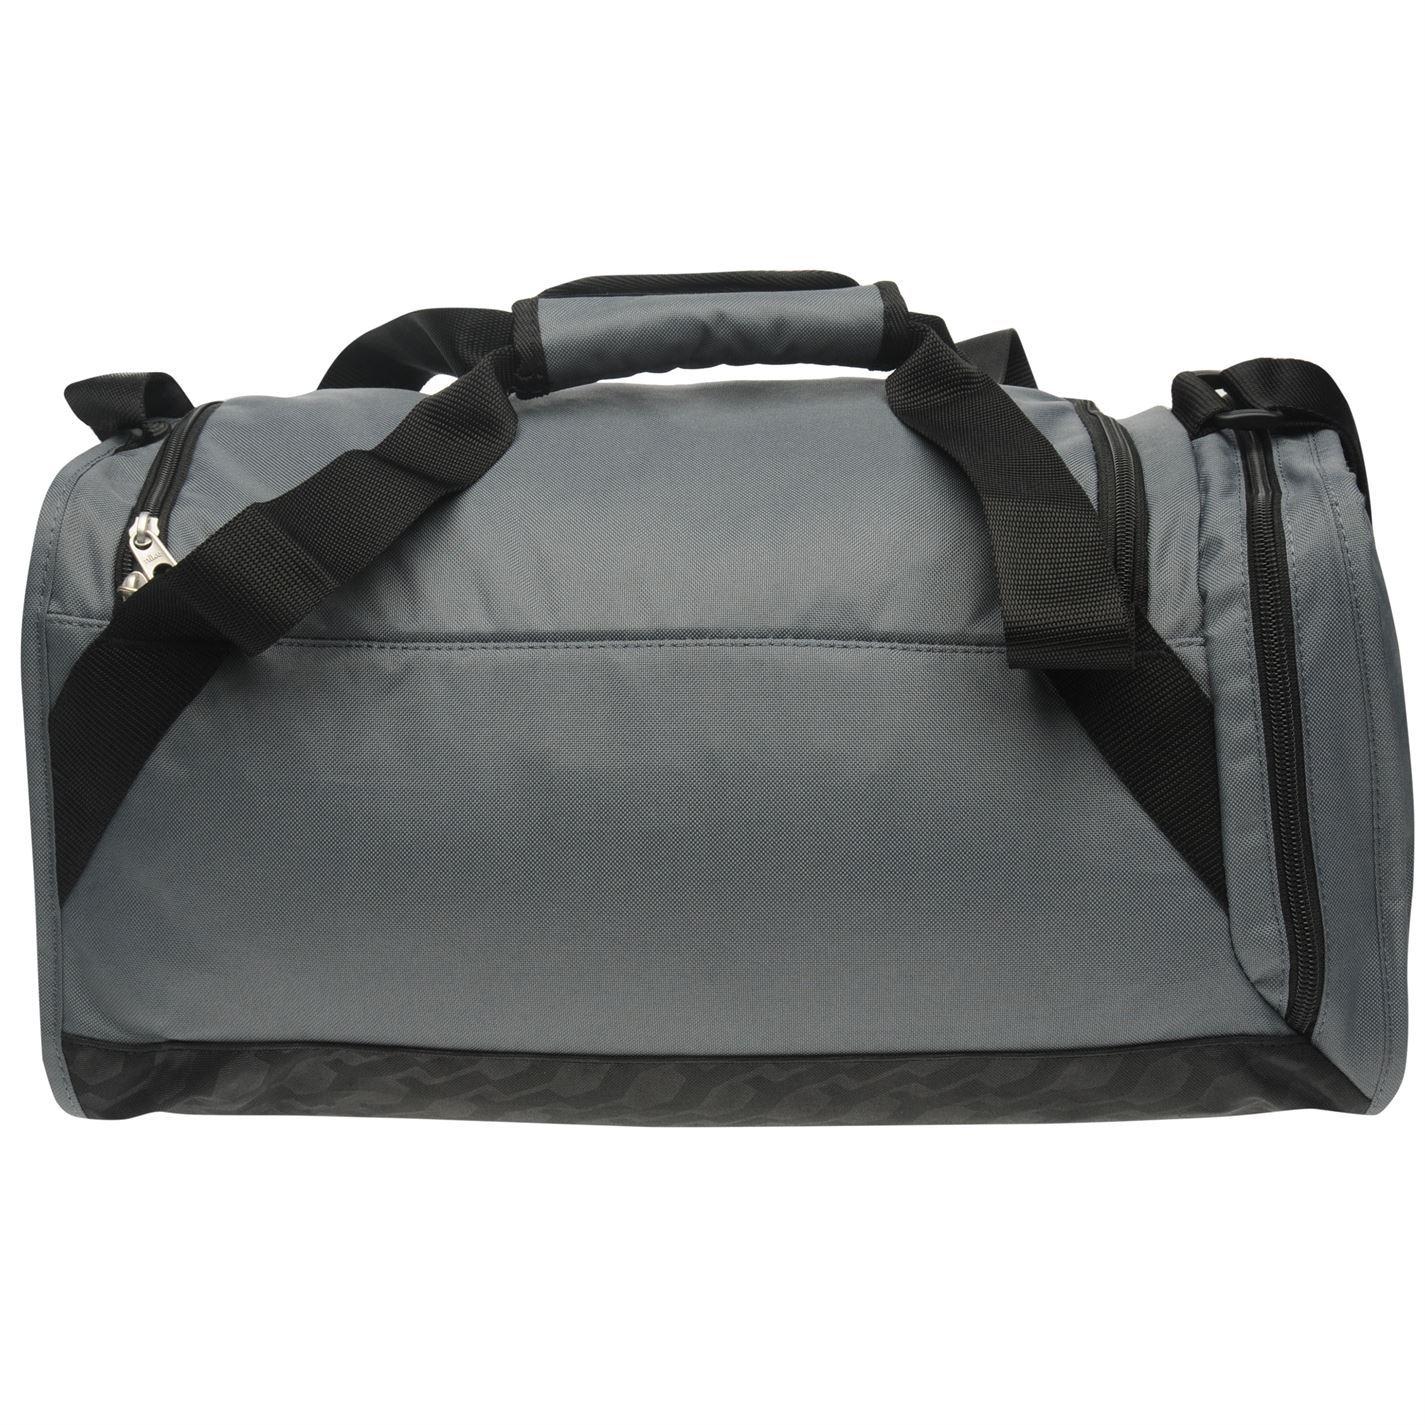 Bag Nike Grip Carryall Brasilia Small Gym Kit Grey Holdall Ebay Sports ASp8wrA